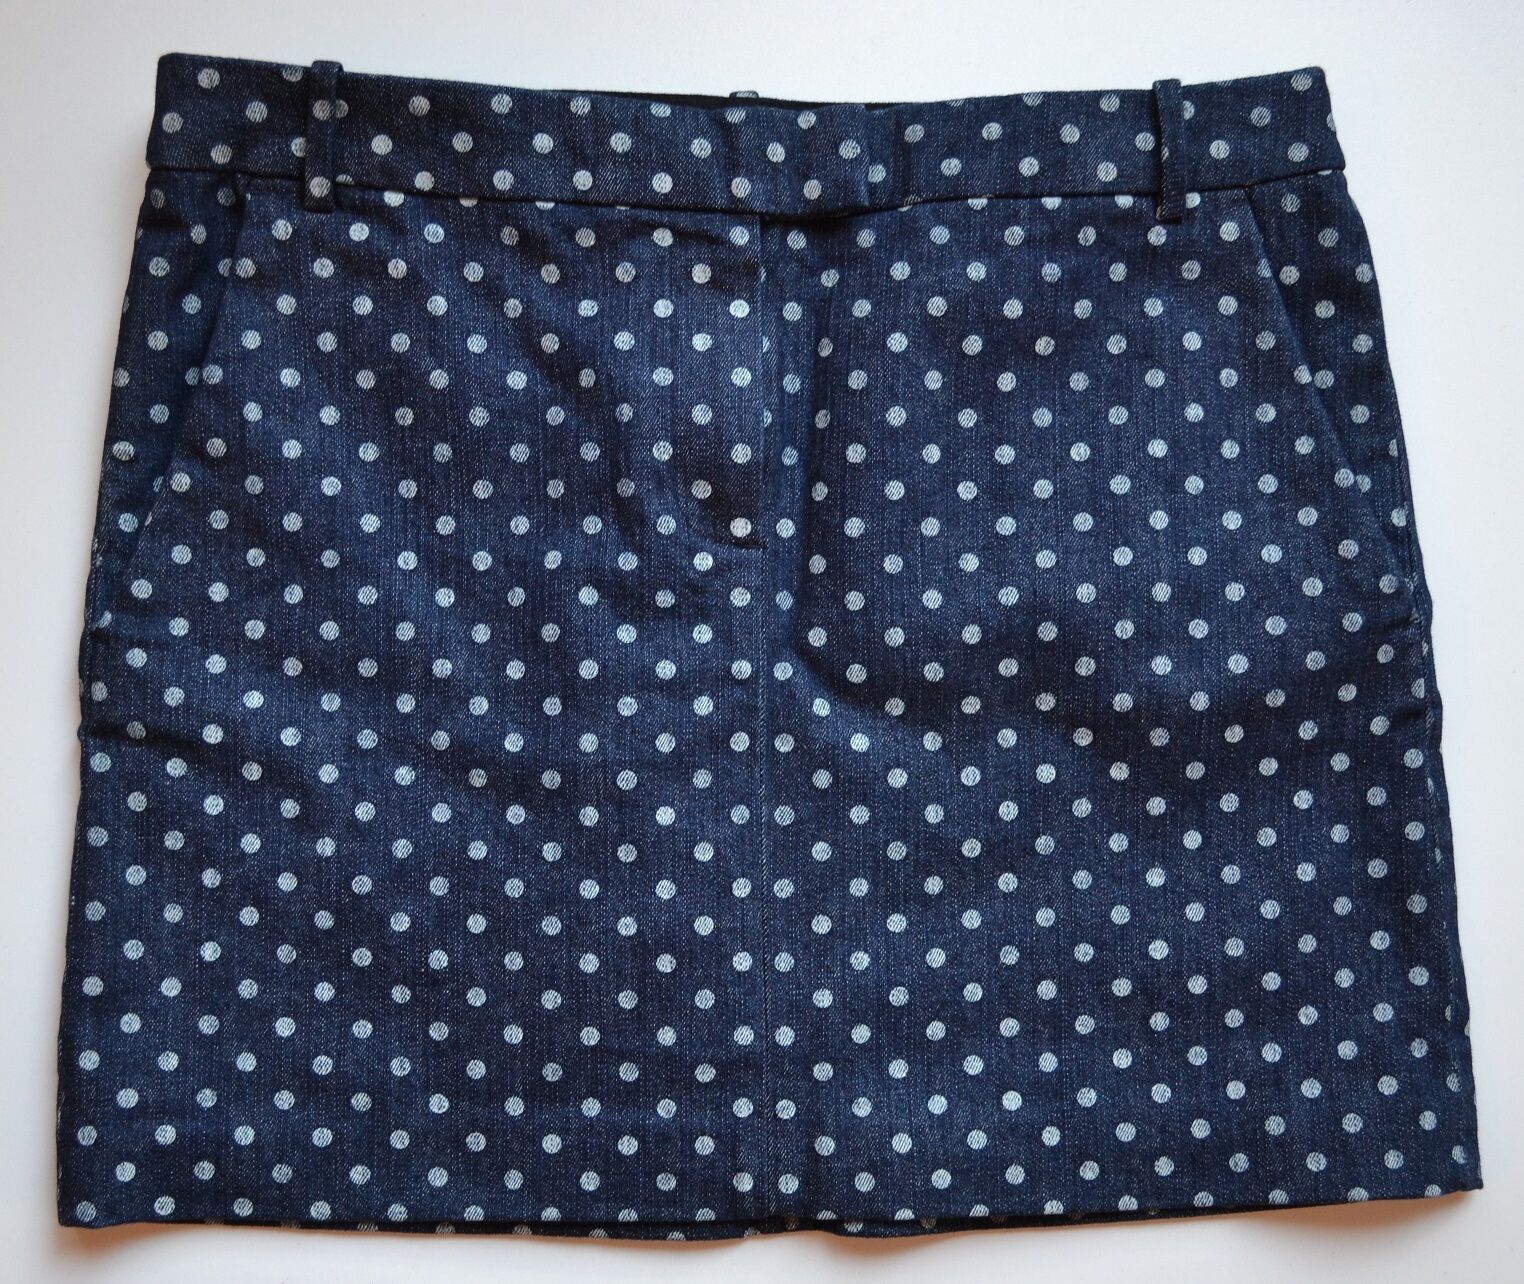 NWT J Crew Polka Dot Denim Mini Skirt Size 6